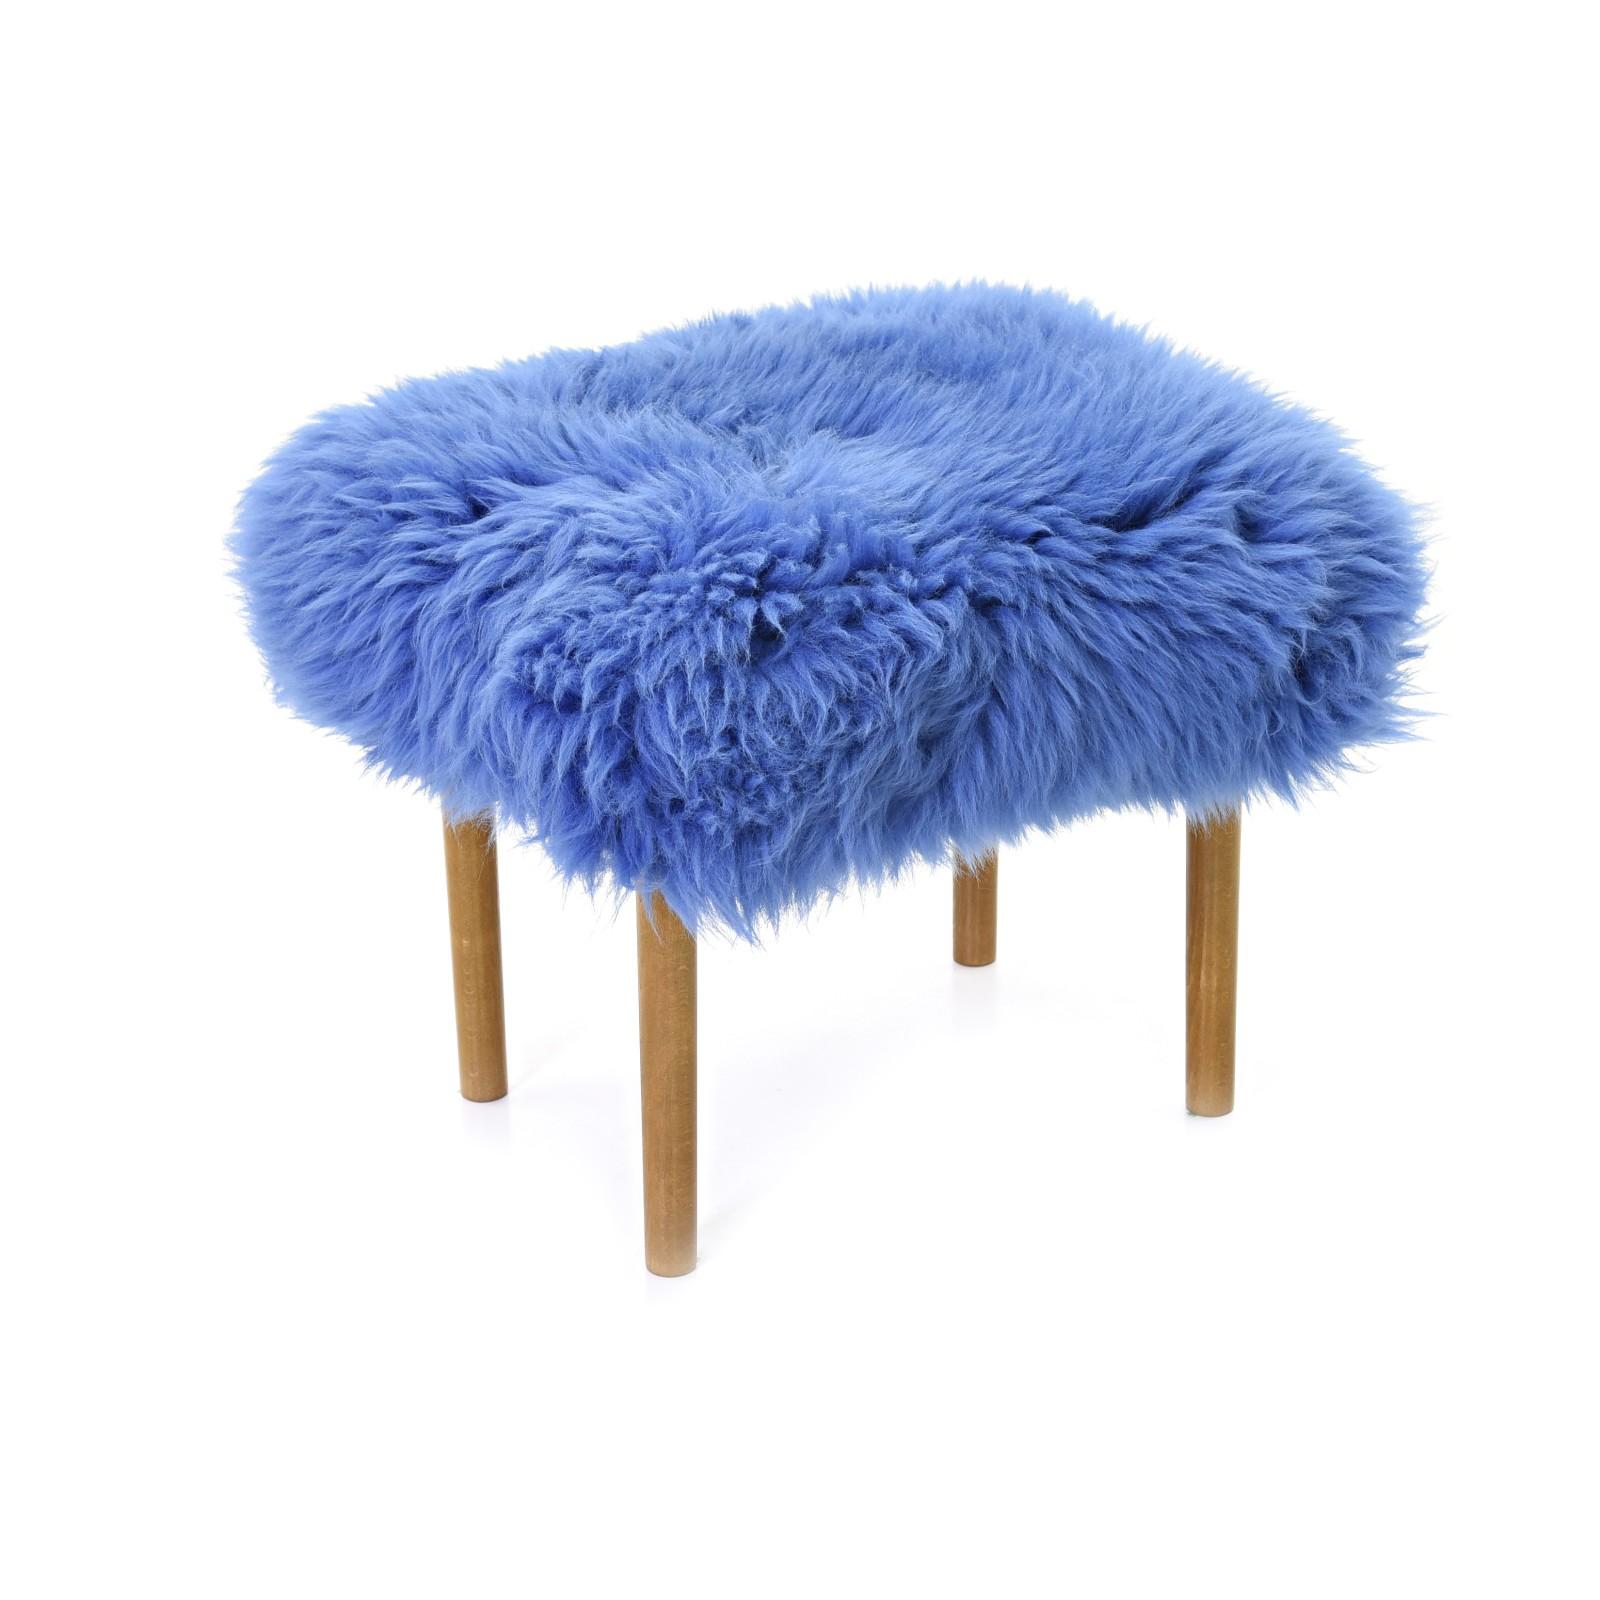 Ceri Sheepskin Footstool Cornflower Blue